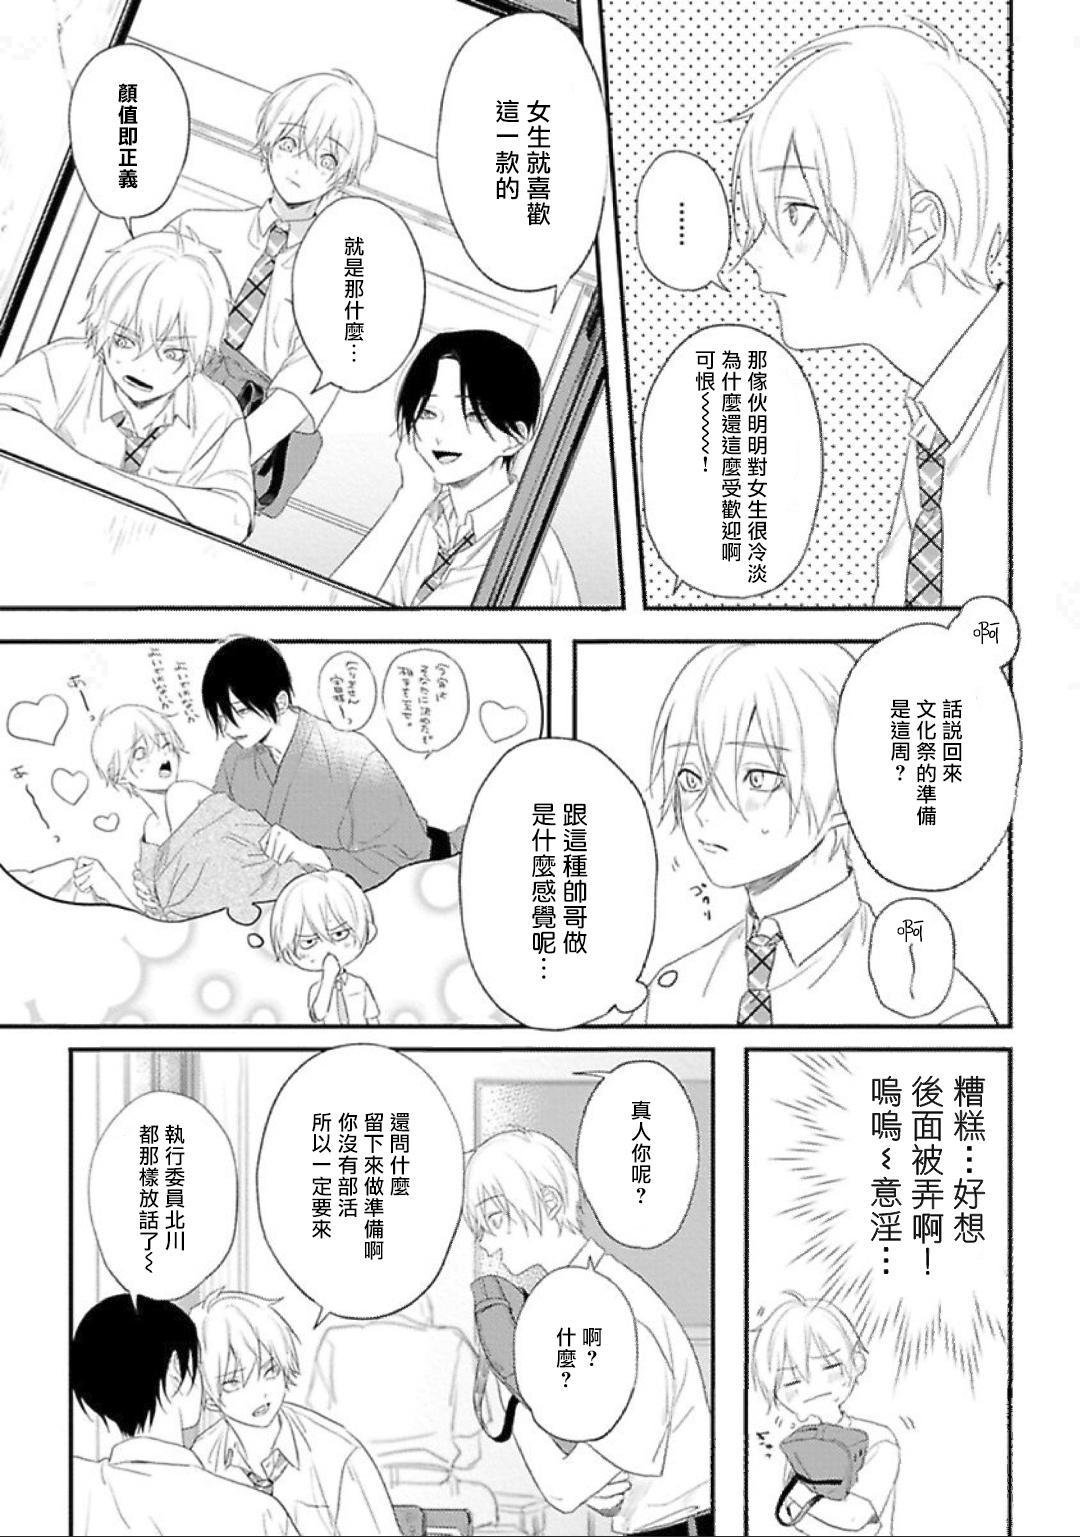 [Utata Hakuto] Houkago Virginity - Virginity afterschool 1-3 [Chinese] [拾荒者汉化组] [Digital] 10